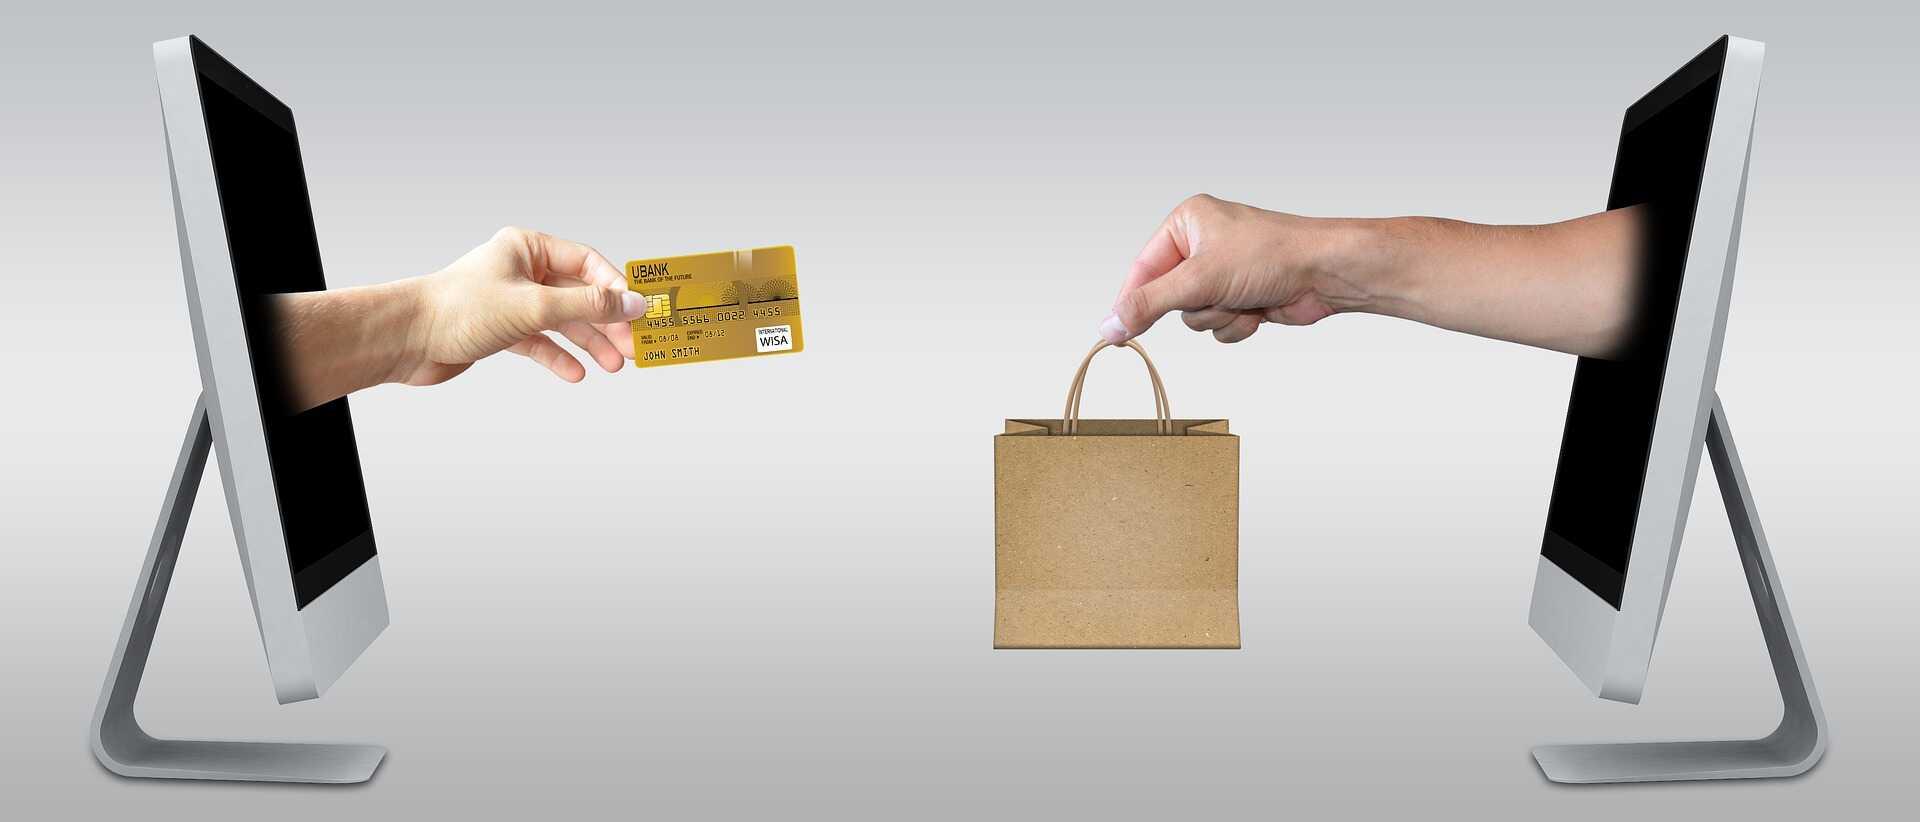 split-de-pagamento